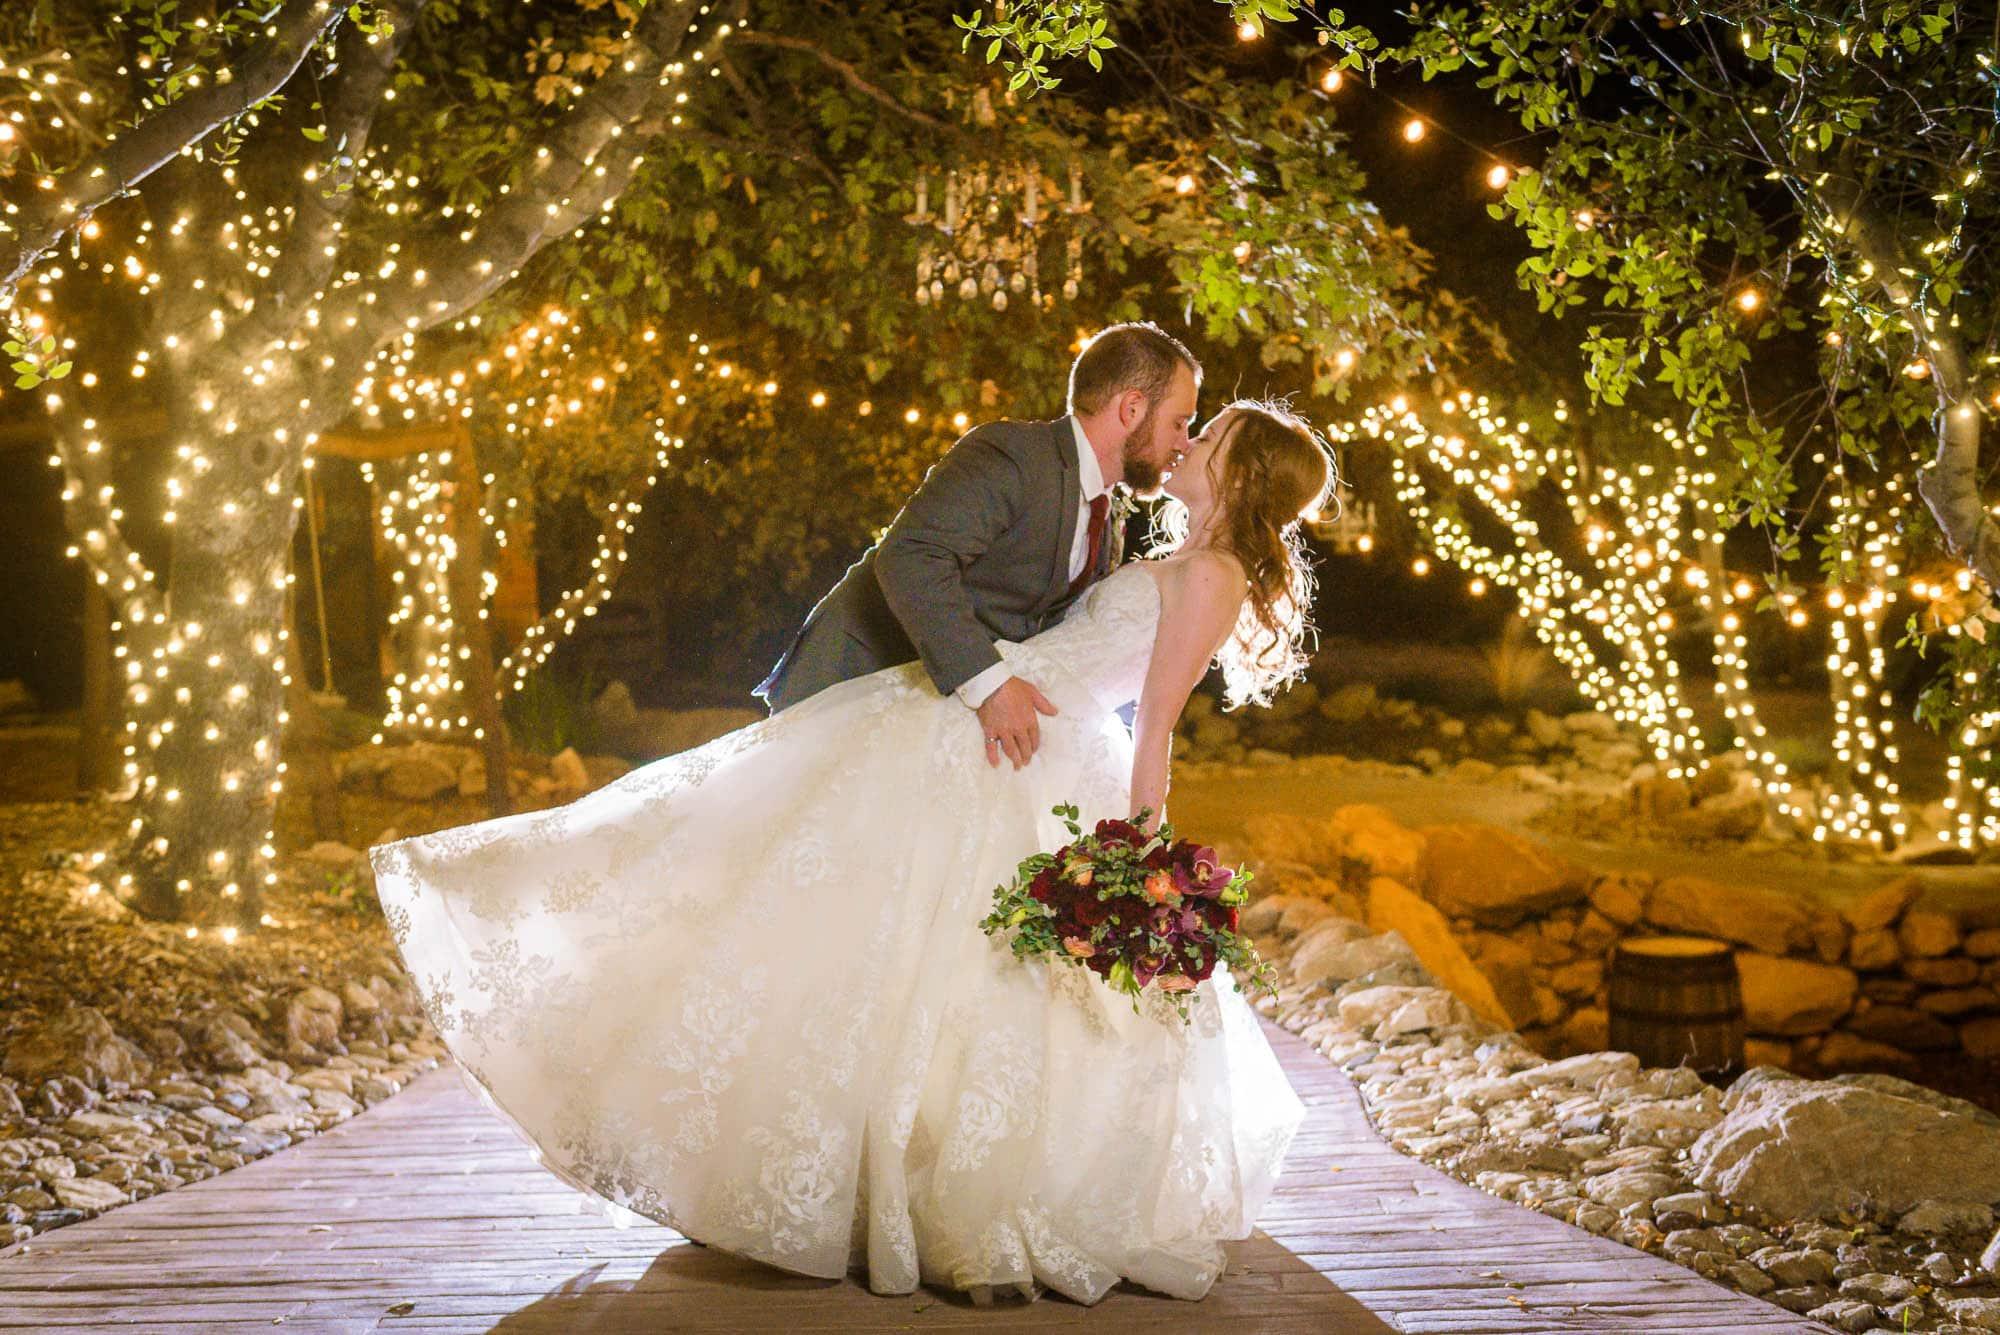 724_Alan_and_Heidi_Serendipity_Garden_Wedding_10-27-2018